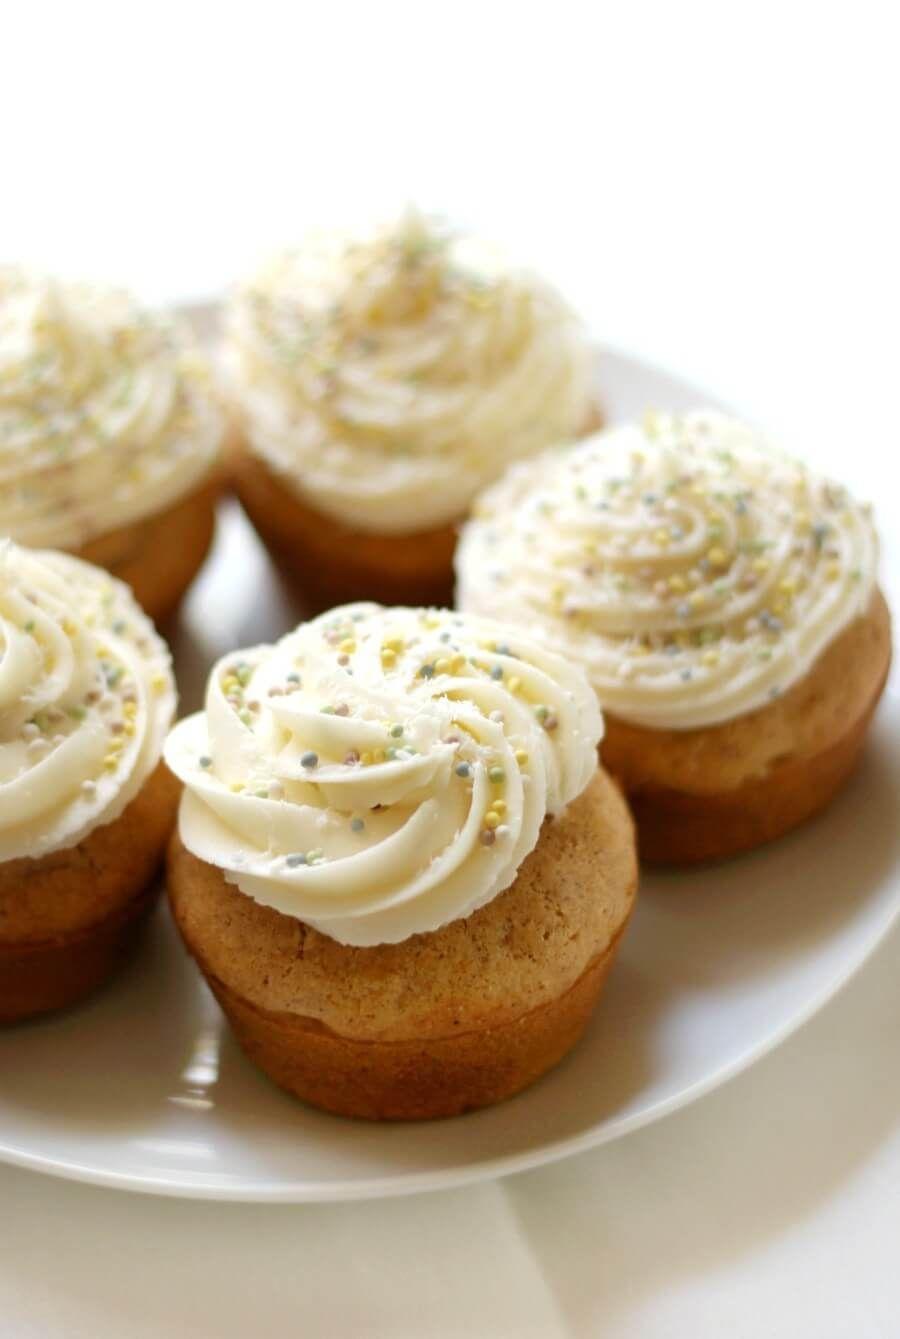 GlutenFree Carrot Cake Cupcakes with Vegan Cream Cheese